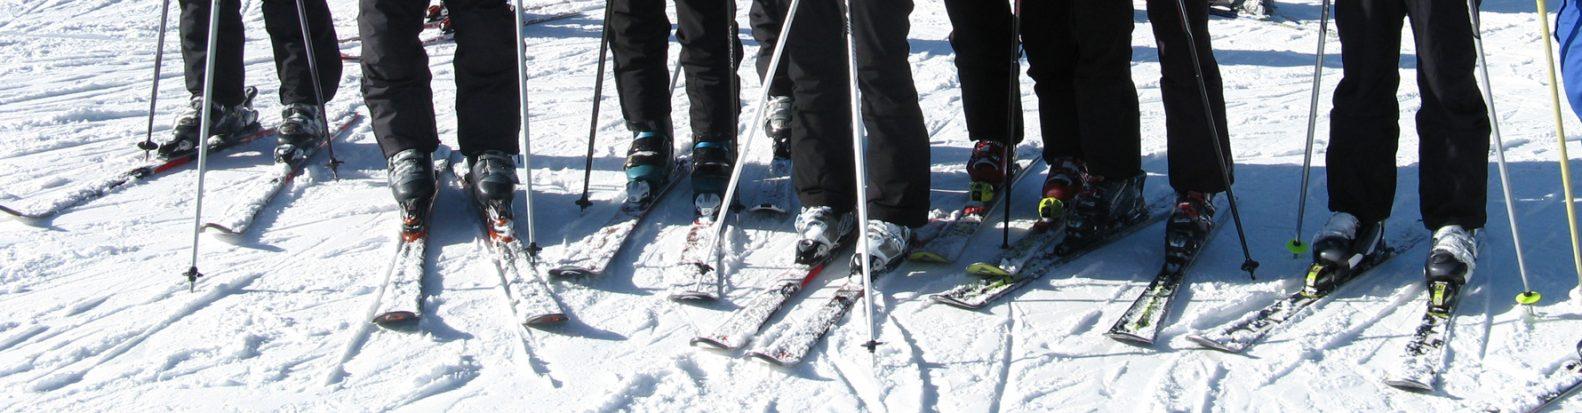 03.03.2018 Wintersporttag in Oberstdorf/Riezlern